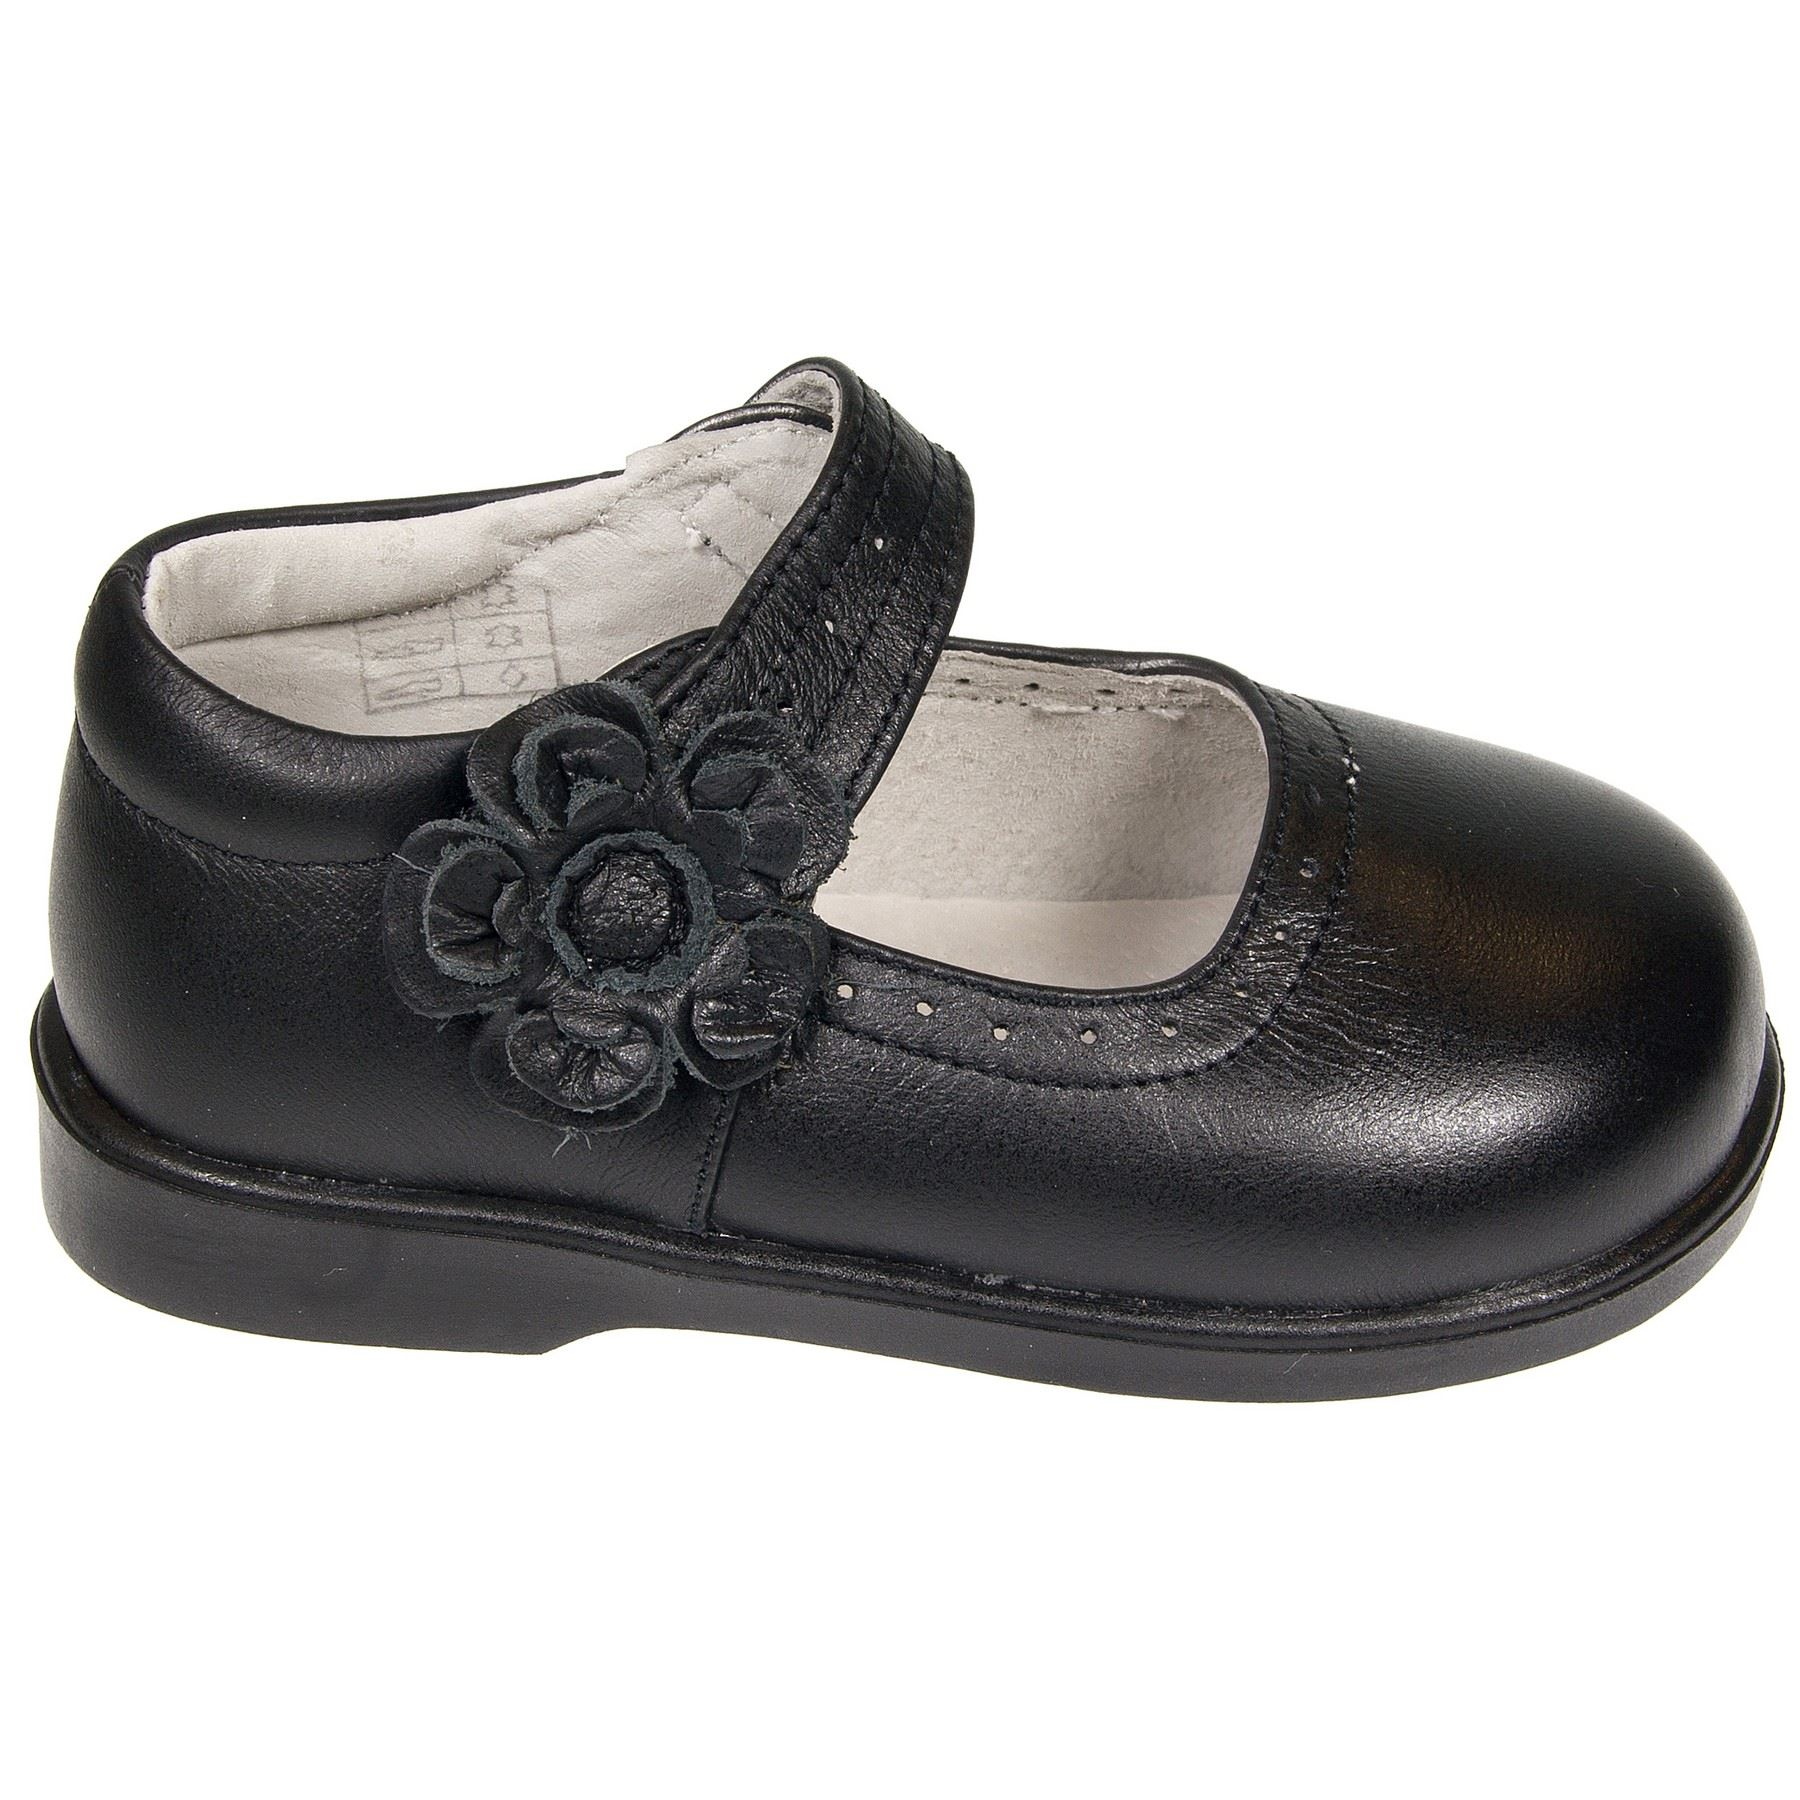 chaussure cuir v ritable fille b b enfant chaussure ecole noir mat avec velcro ebay. Black Bedroom Furniture Sets. Home Design Ideas